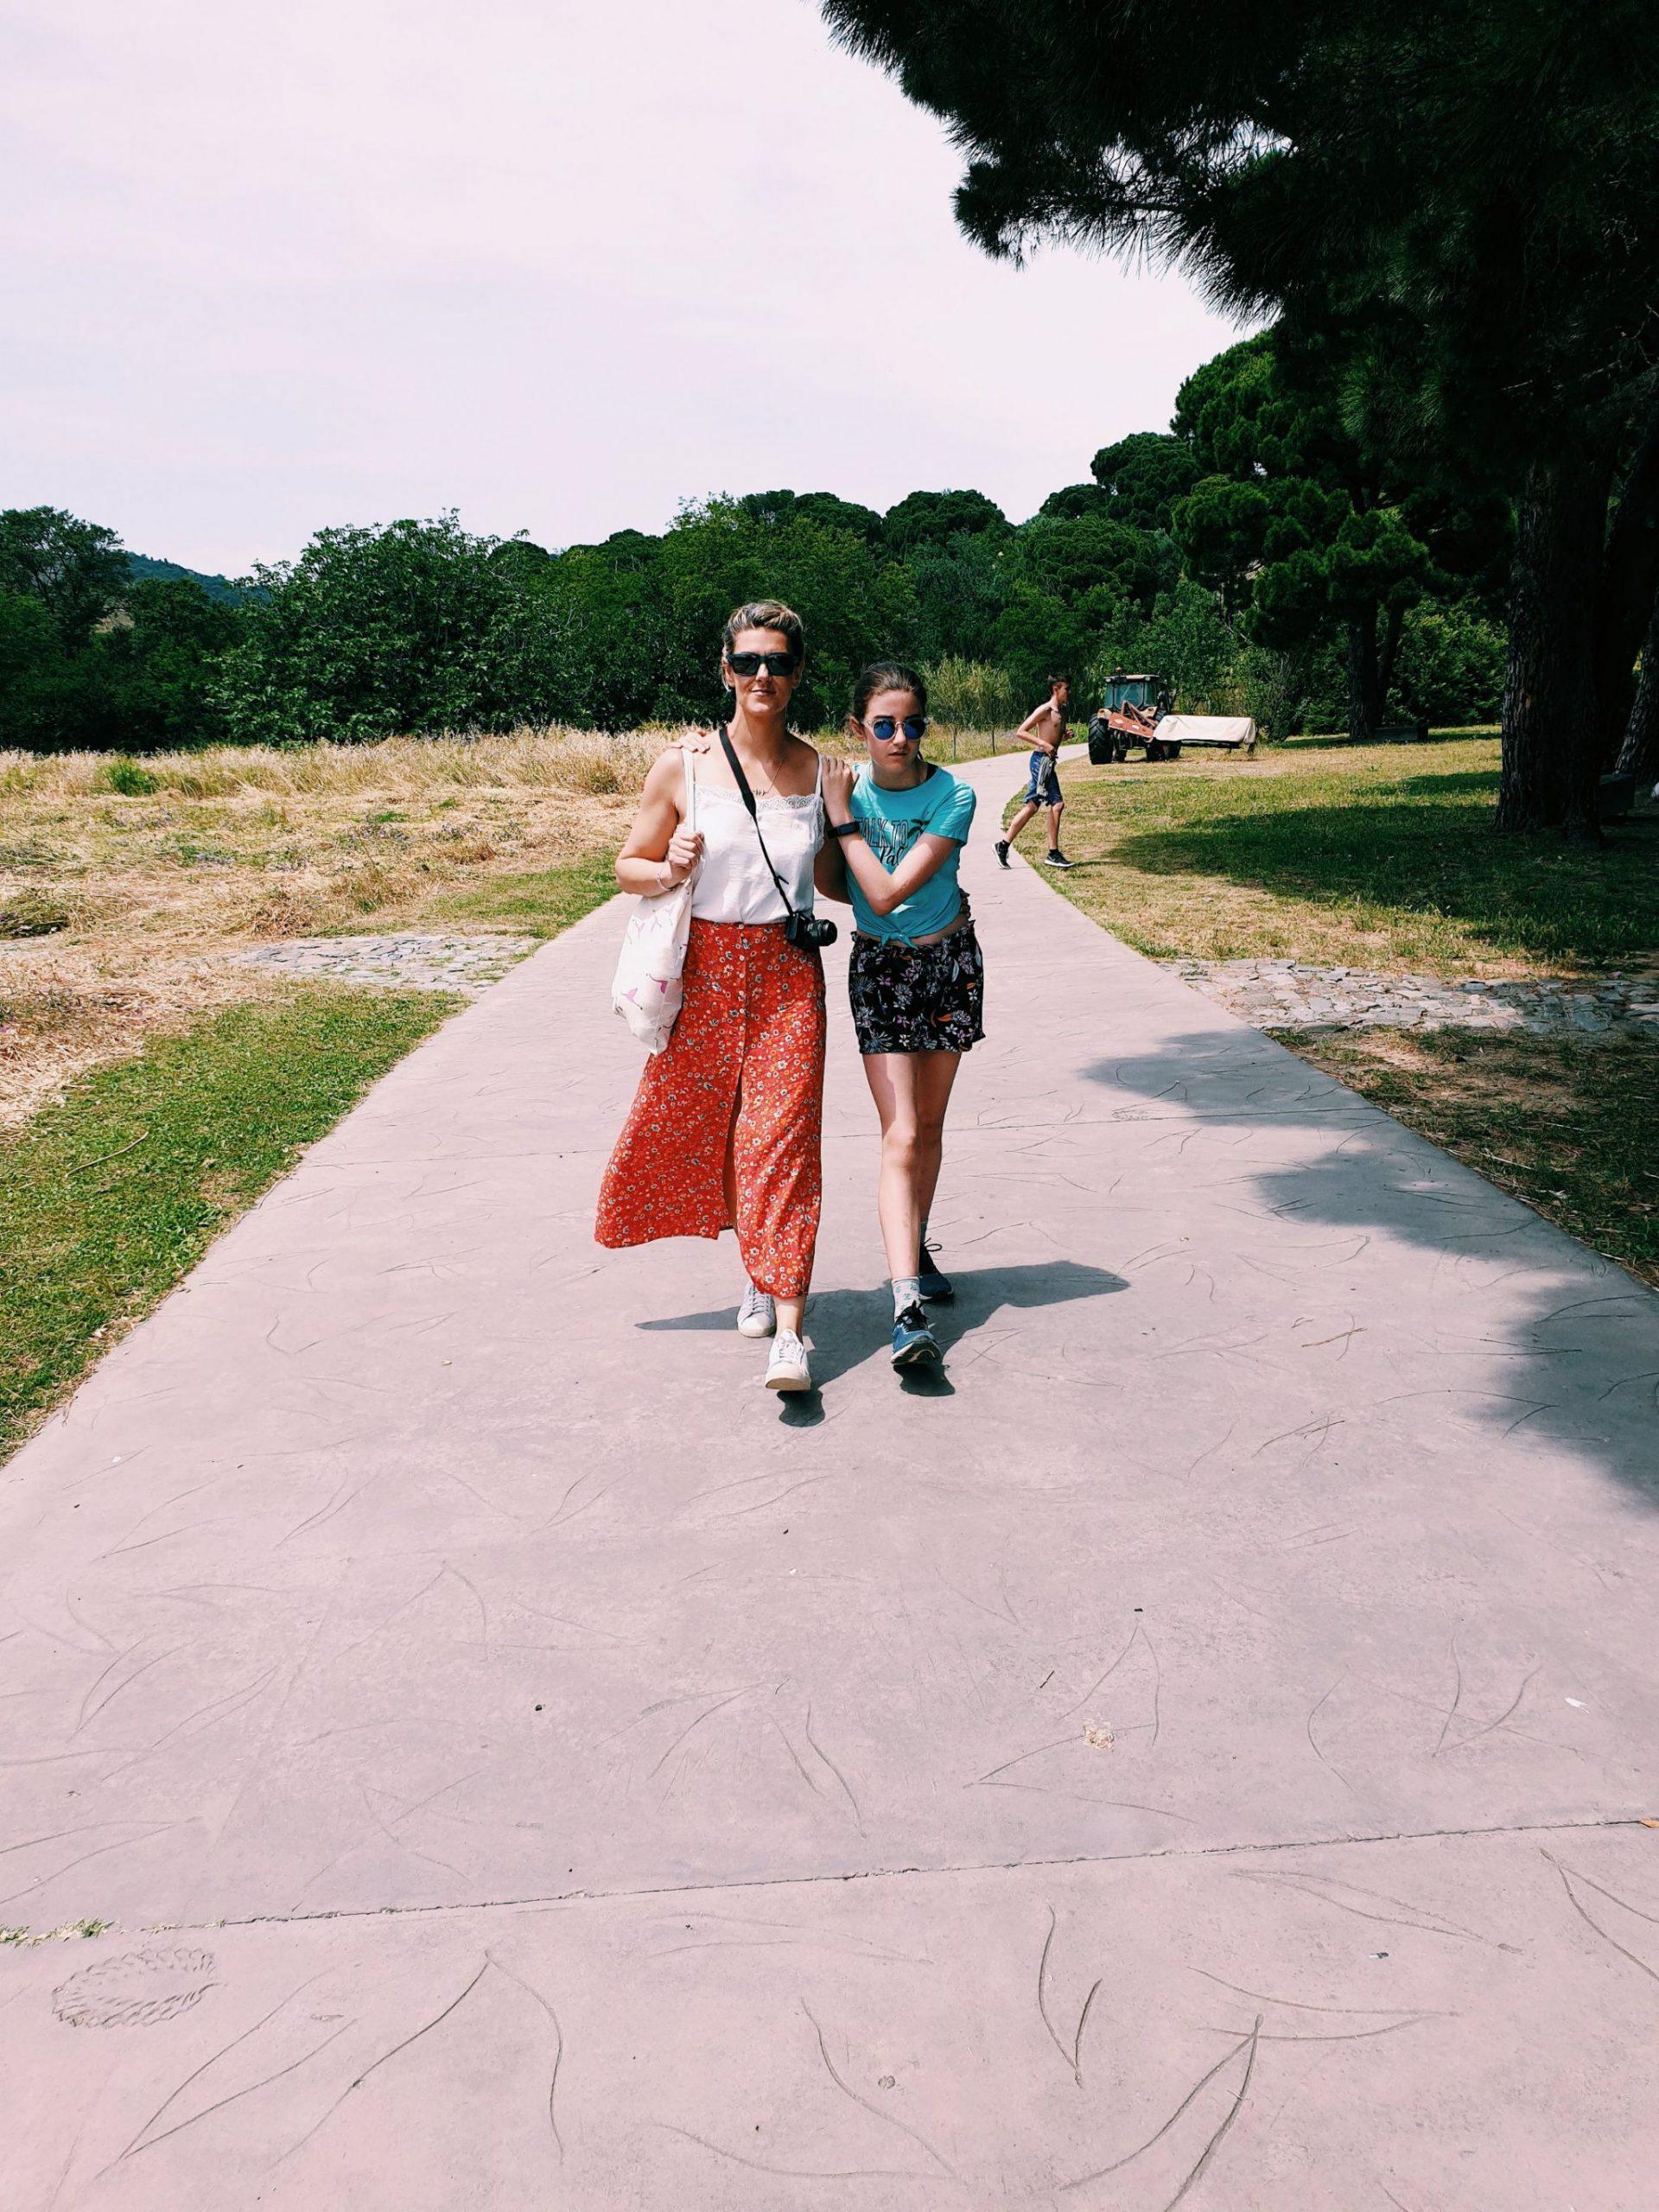 Strolling at Paulilles